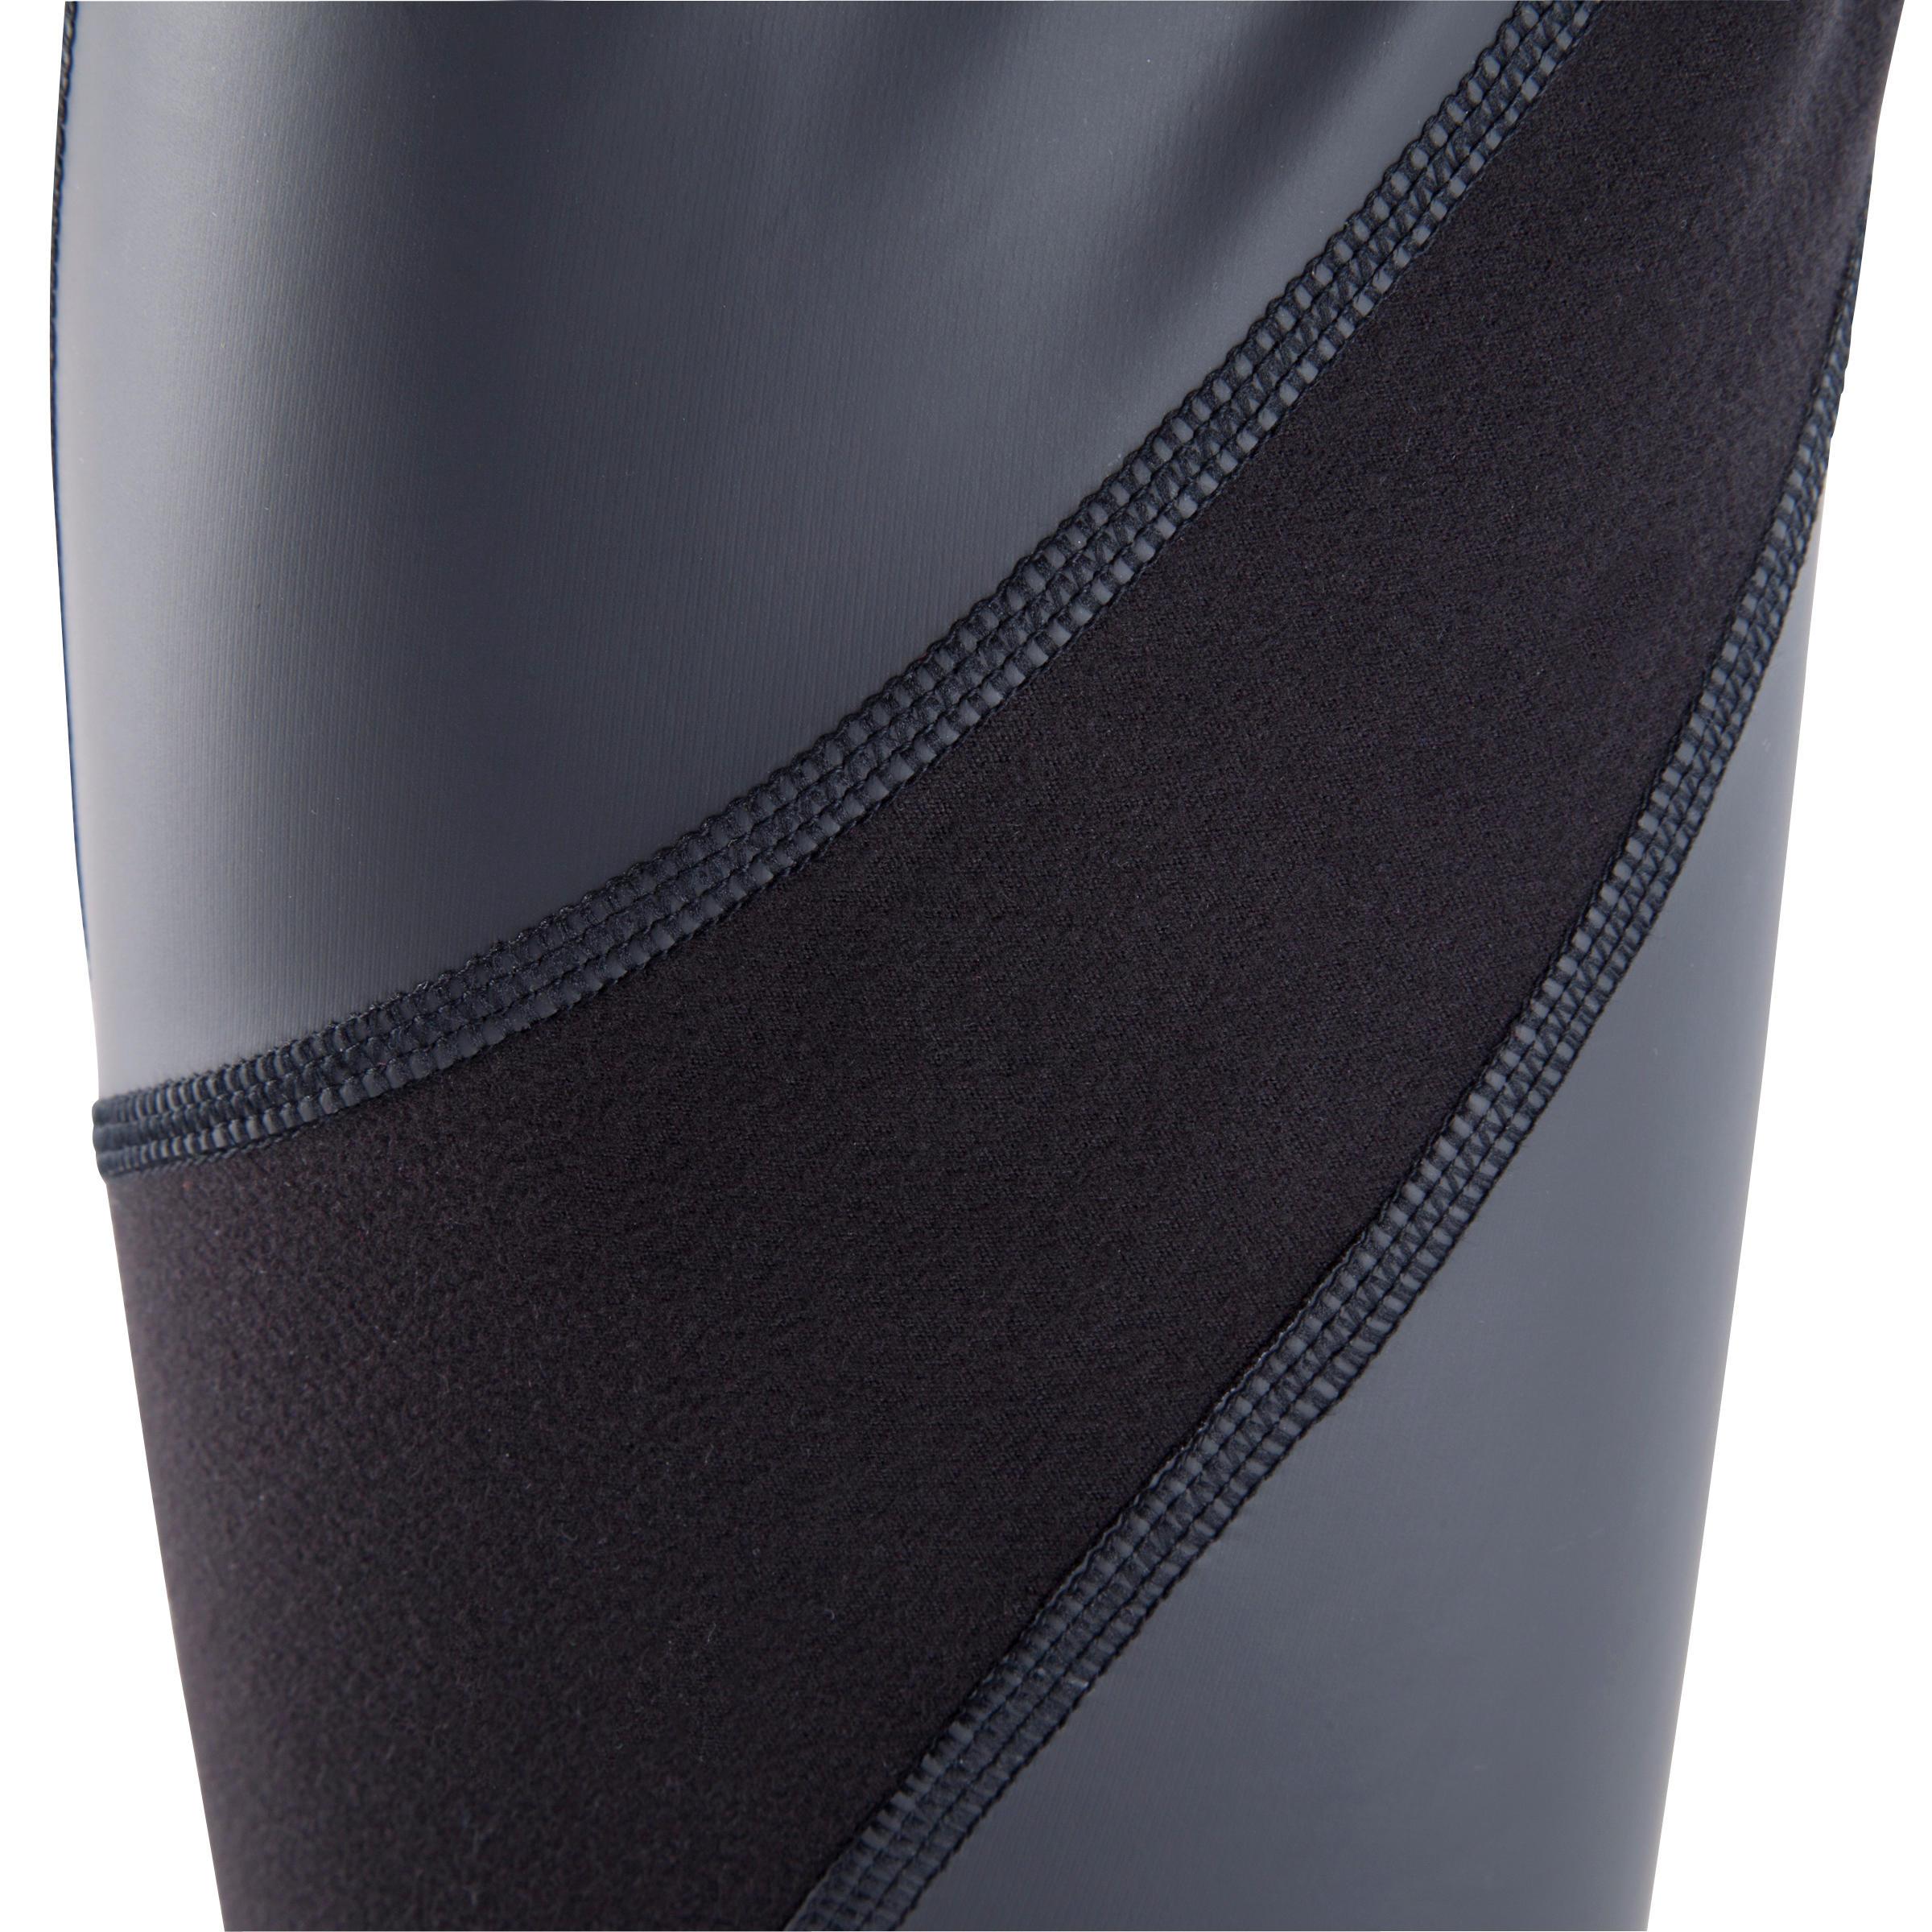 Legging de sudation fitness cardio femme noir SWEAT +